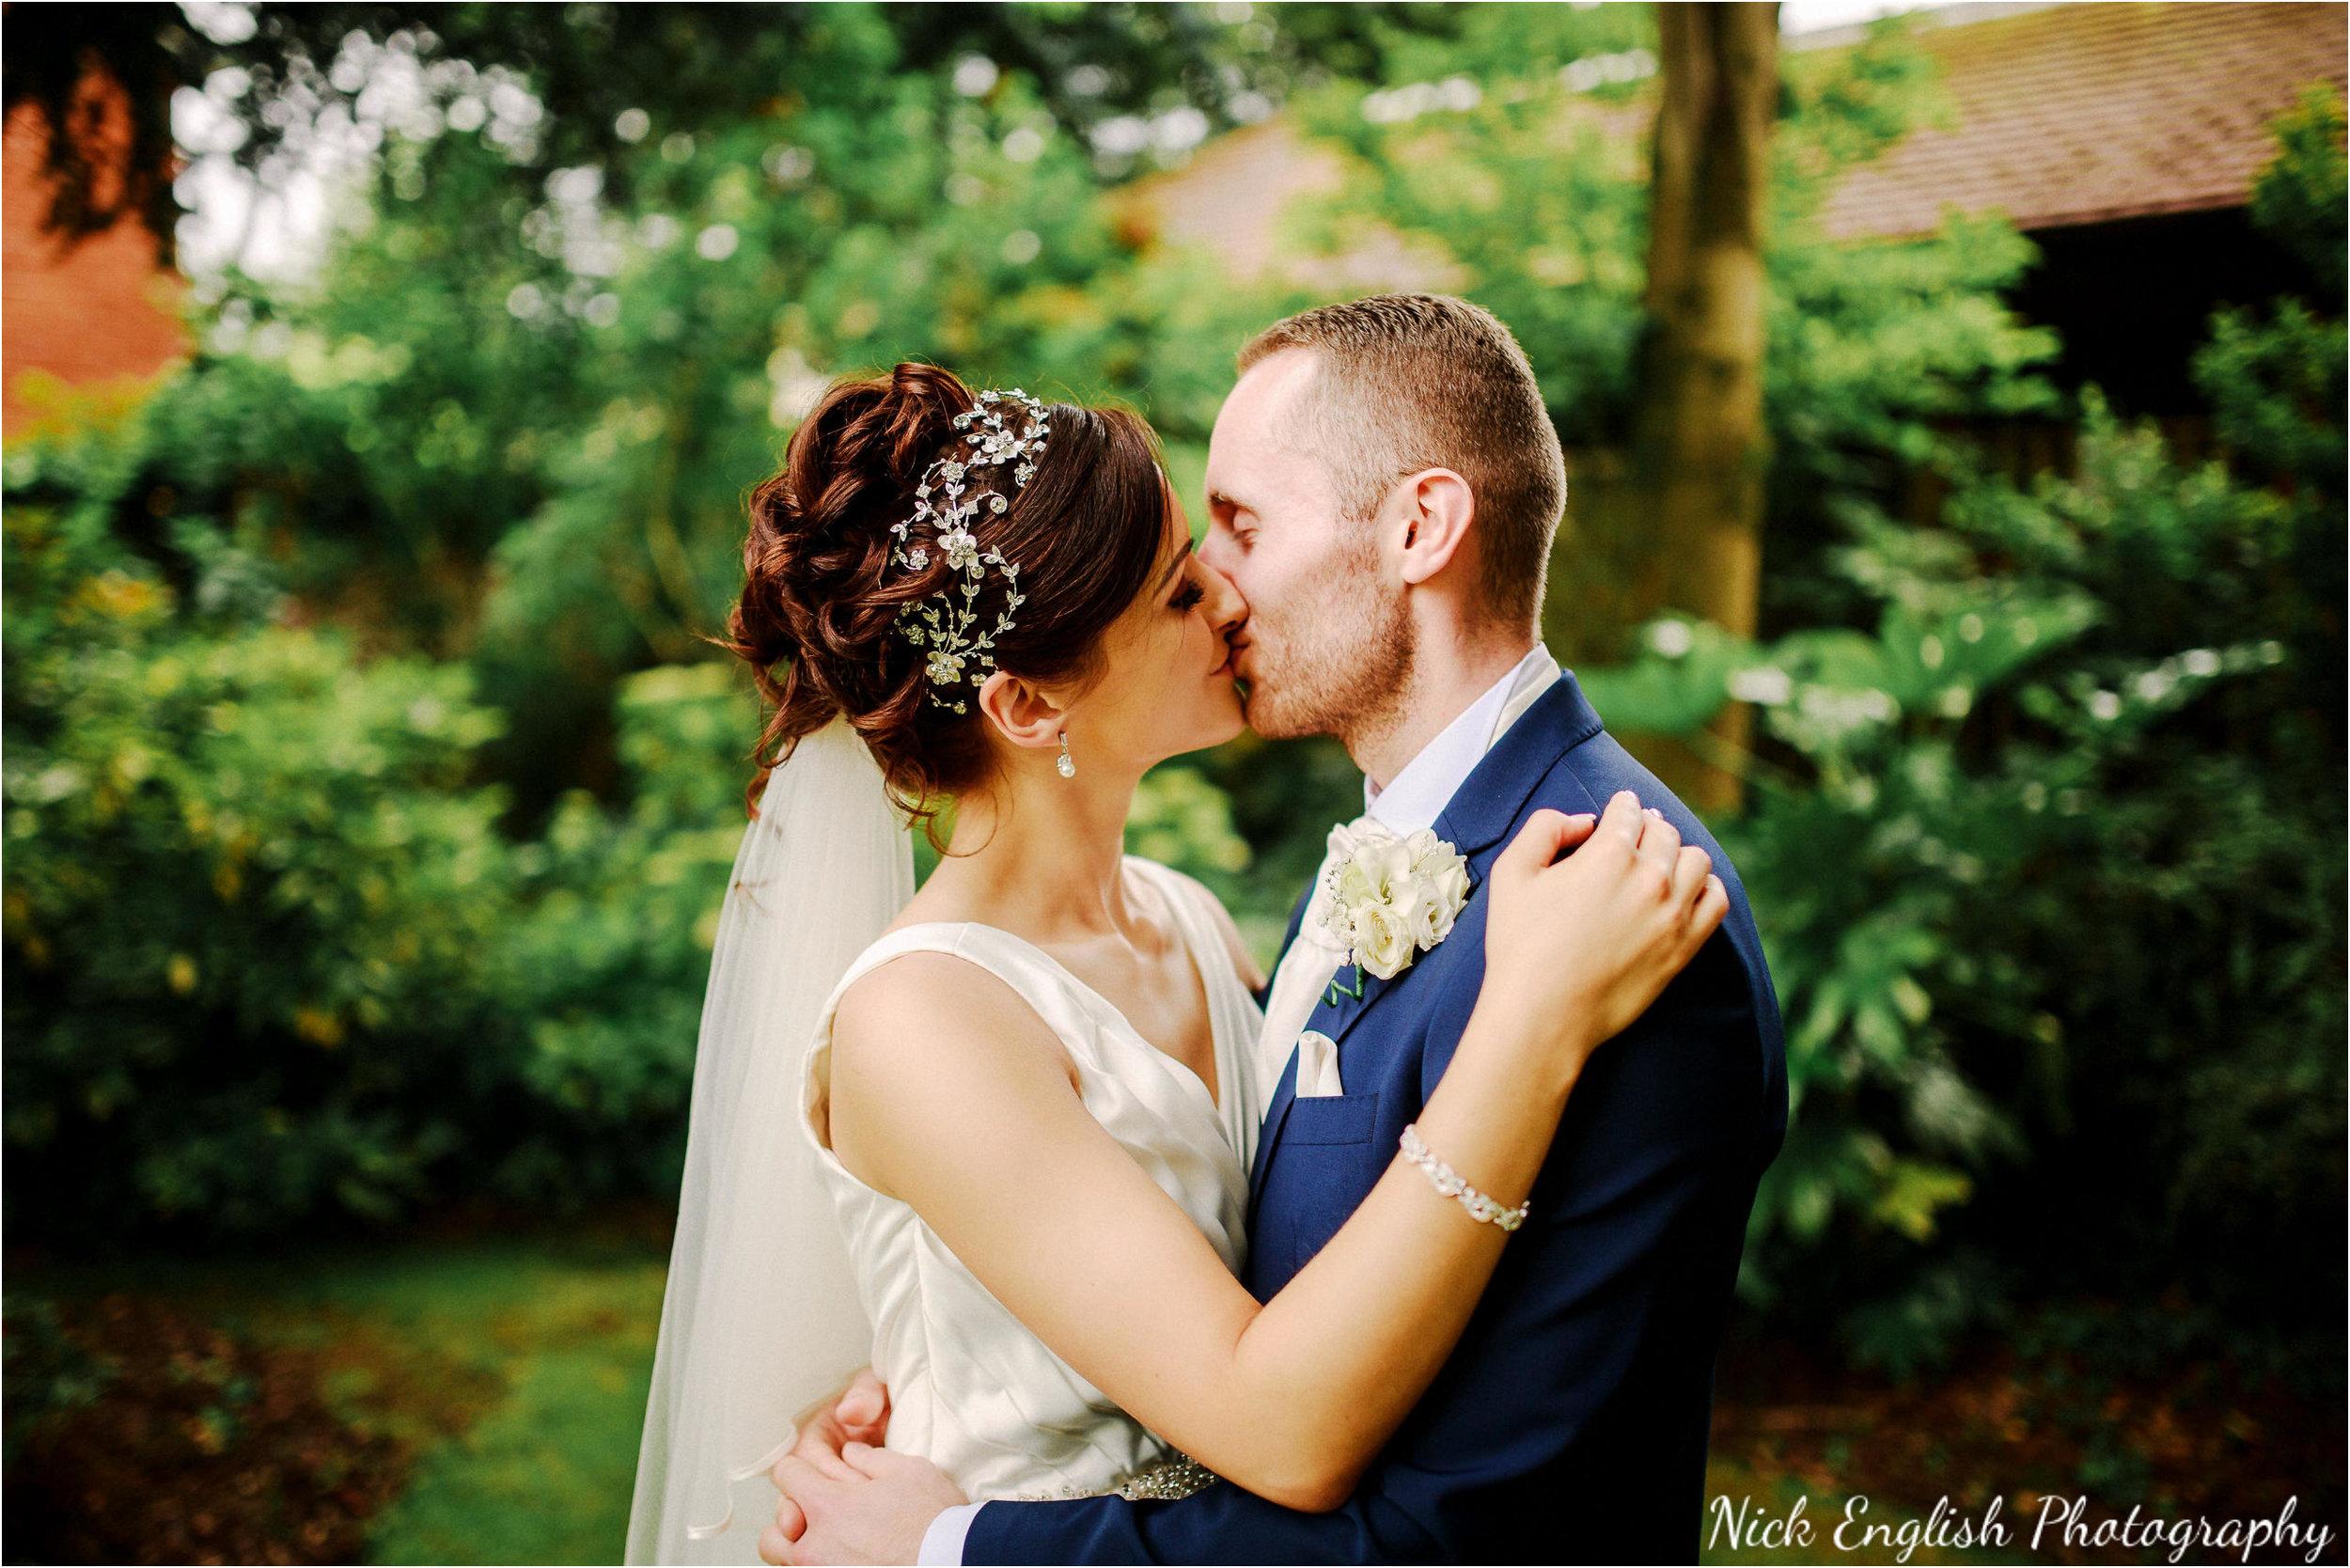 Emily David Wedding Photographs at Barton Grange Preston by Nick English Photography 119jpg.jpeg